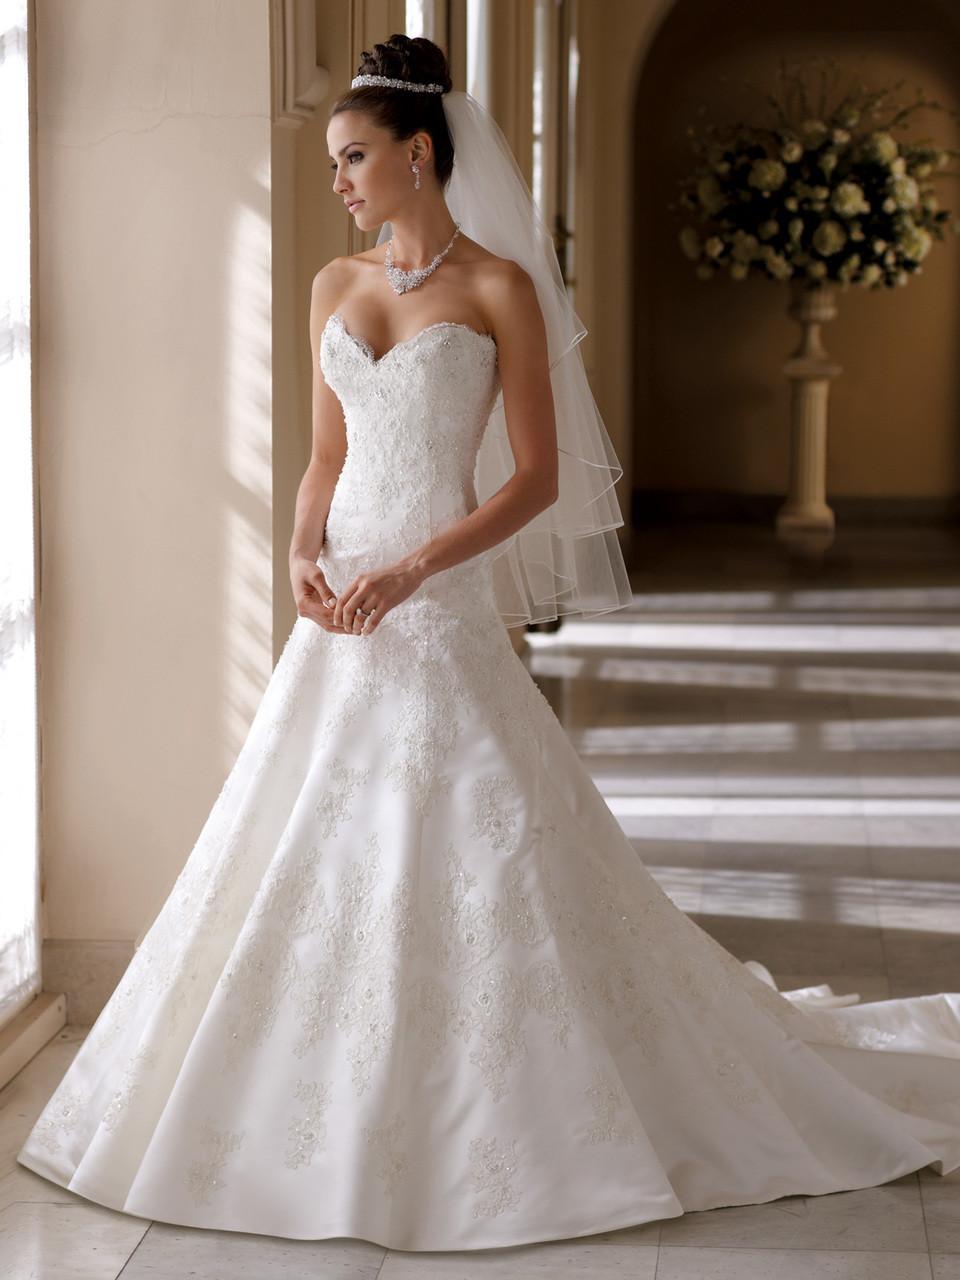 David Tutera Bridal Gown Helen 113215 On Sale Dimitra Designs